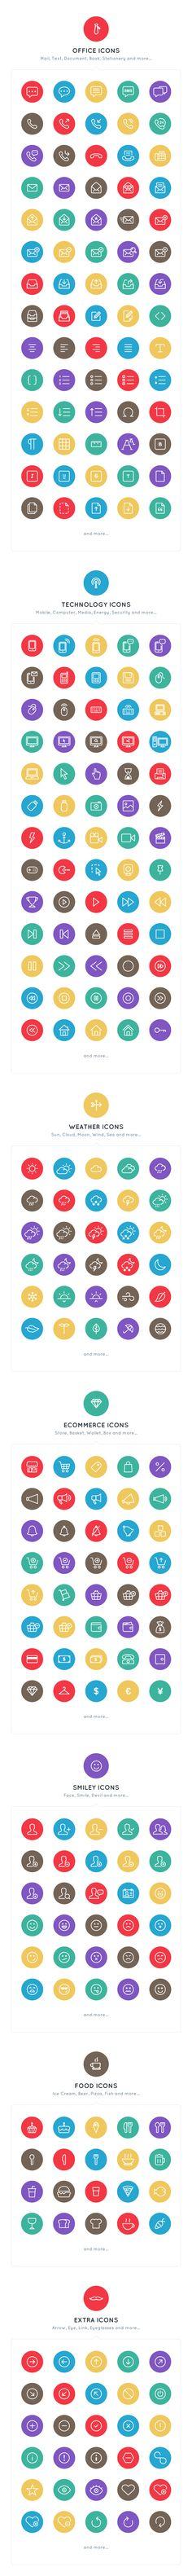 Line Icon Set by Agung Syaifudin, via Behance